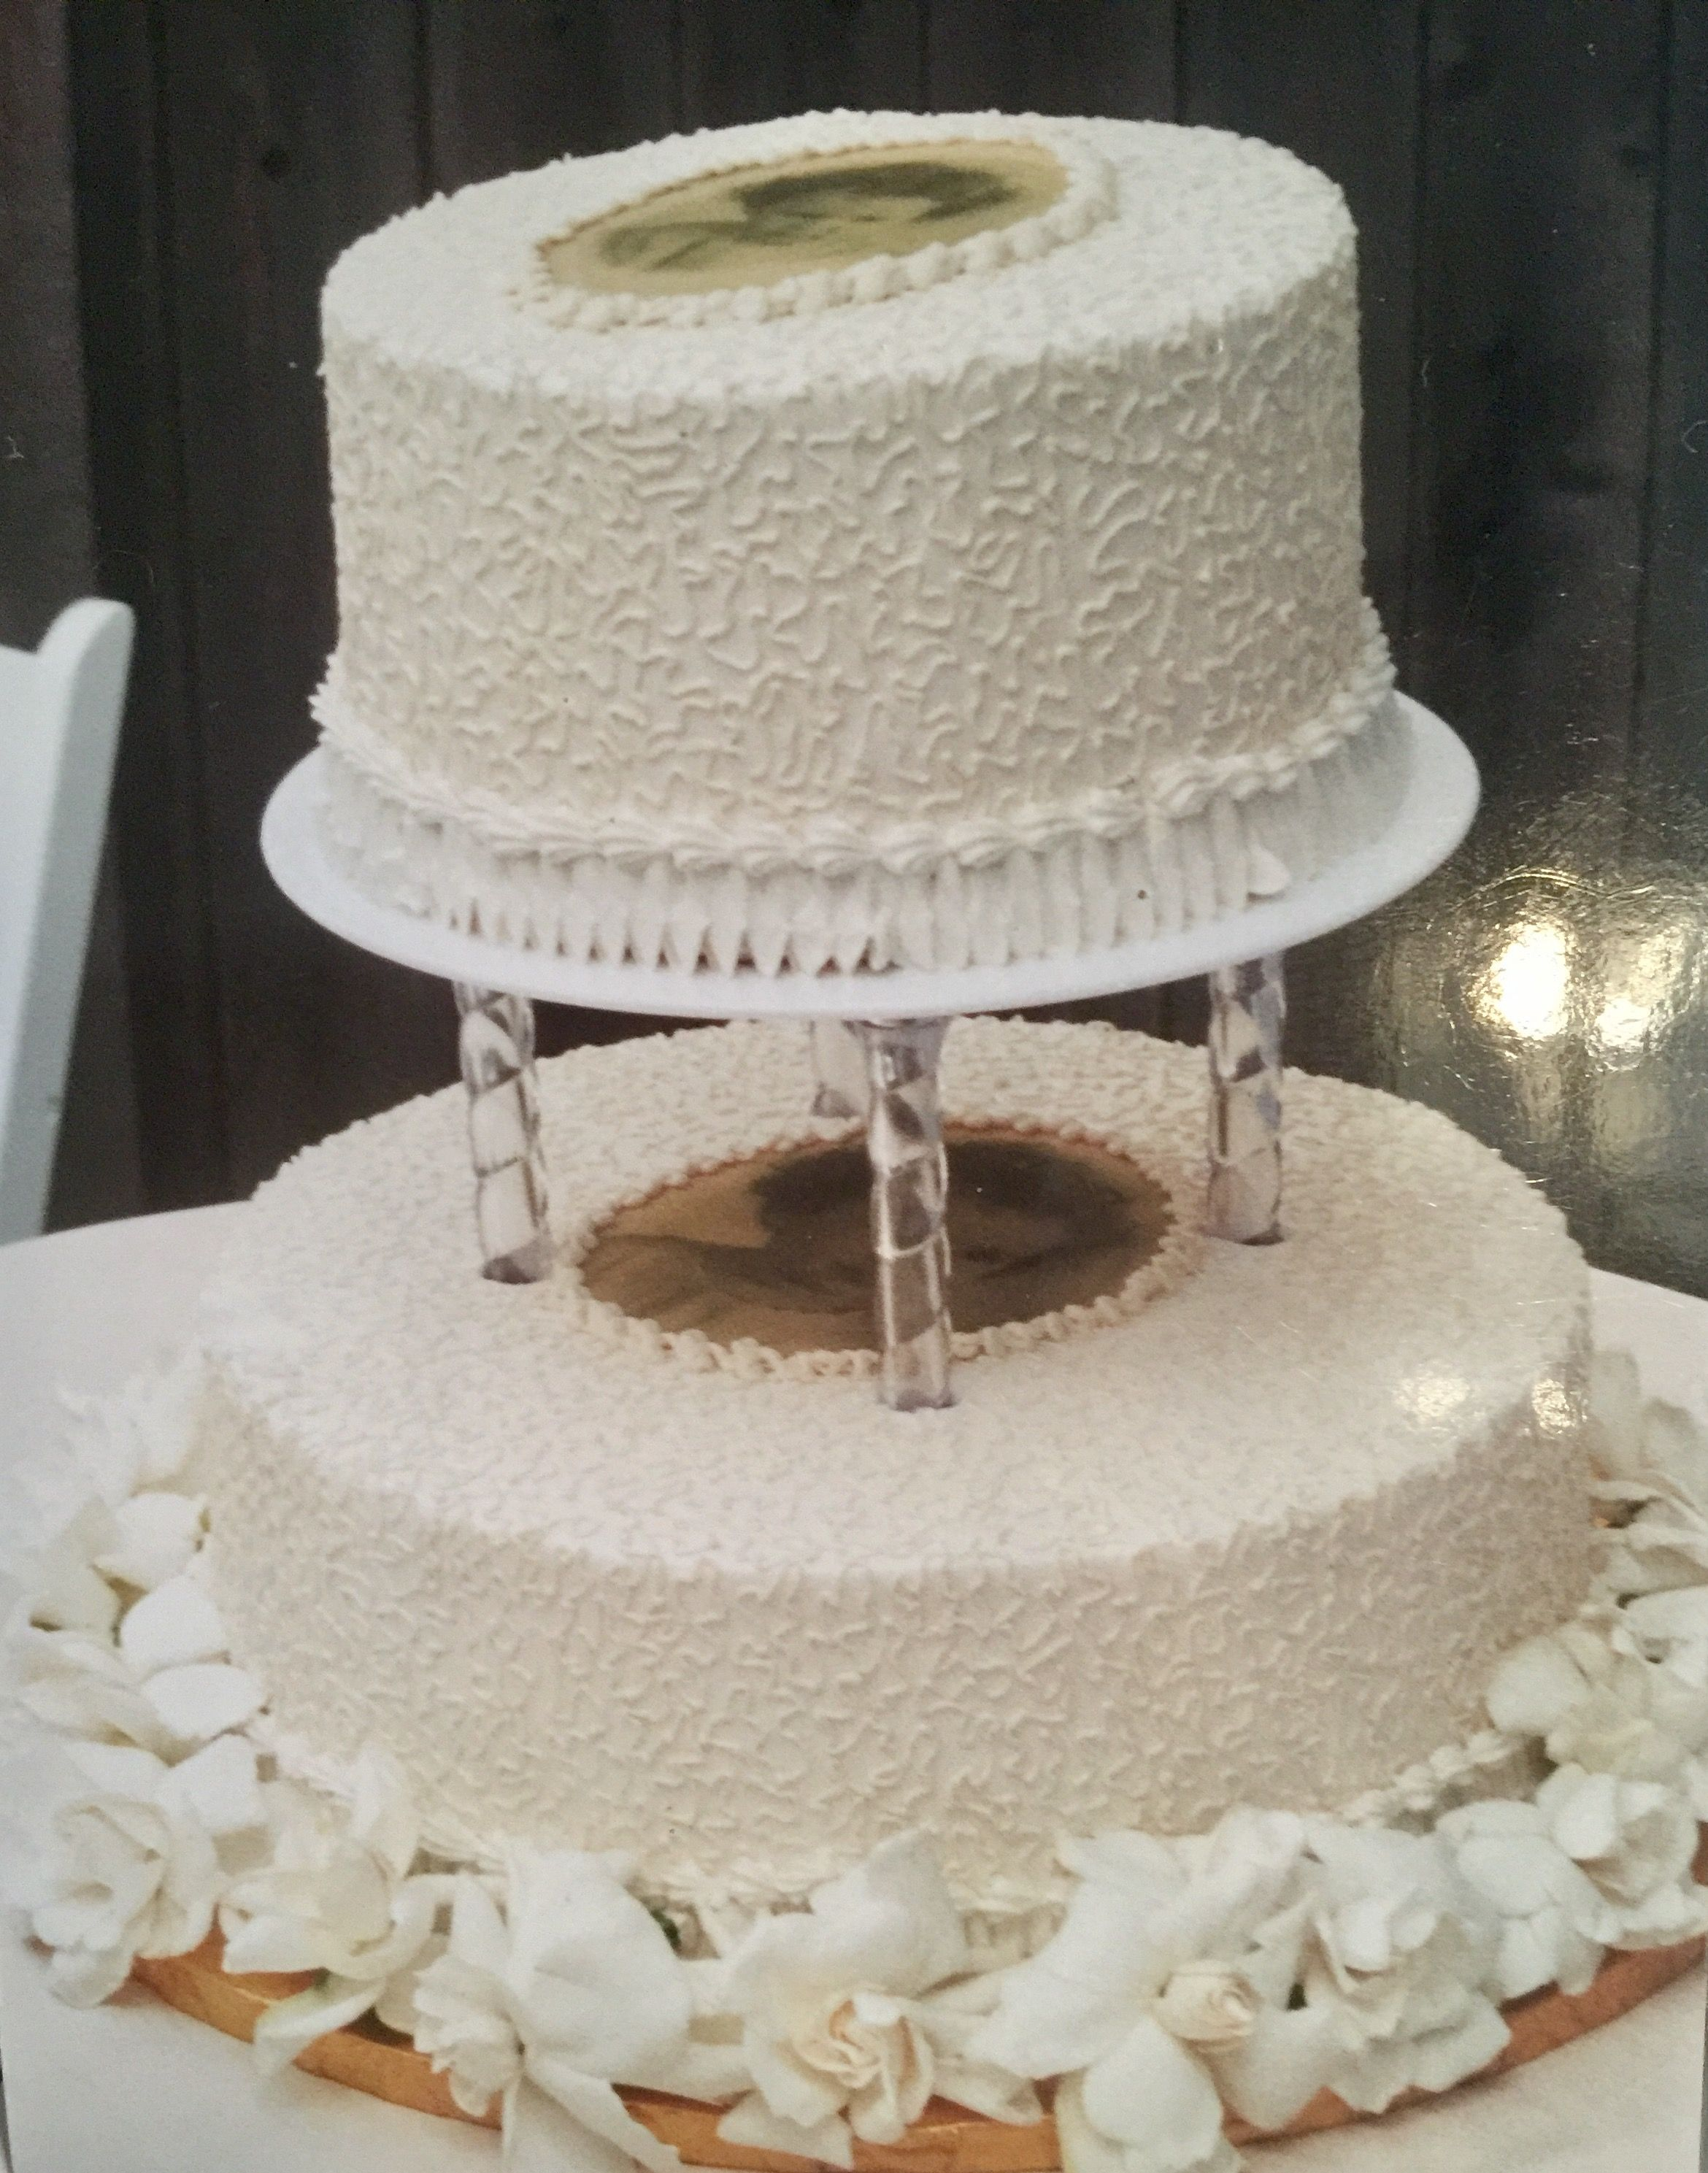 Motherus th birthday party cake from copenhagen bakery burlingame